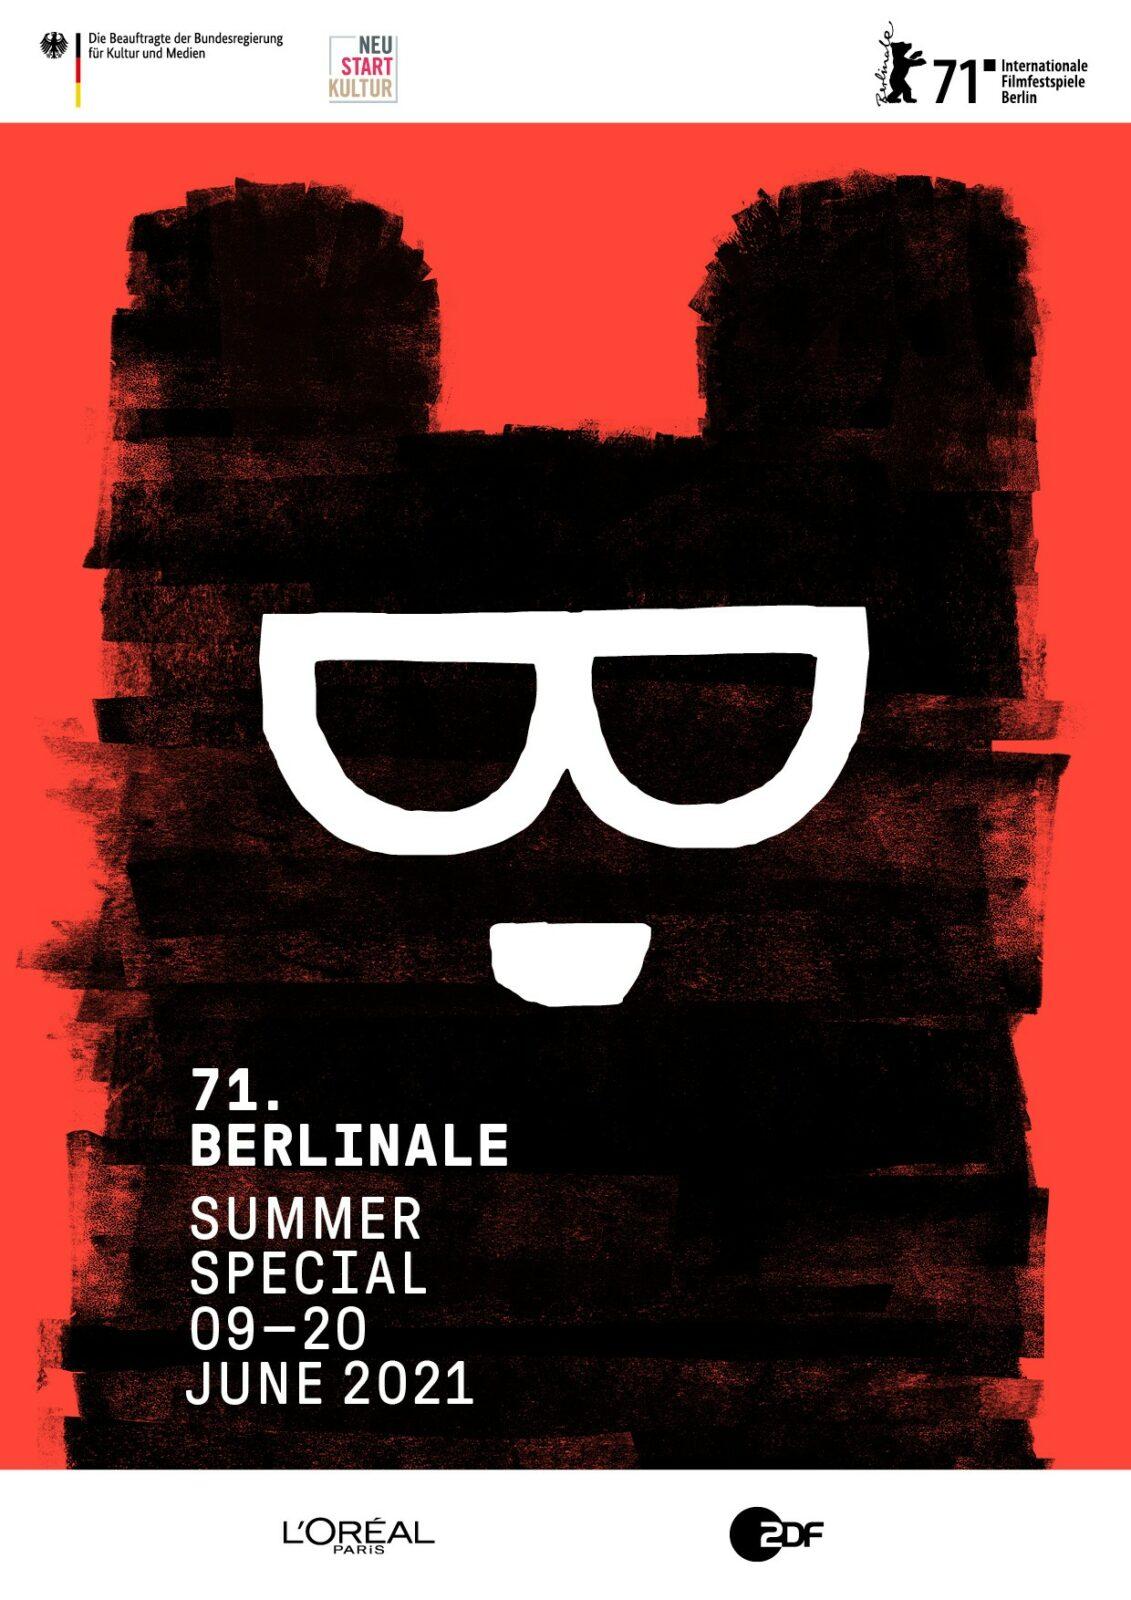 Offizelles Plakat des Berlinale Summer Specials 2021